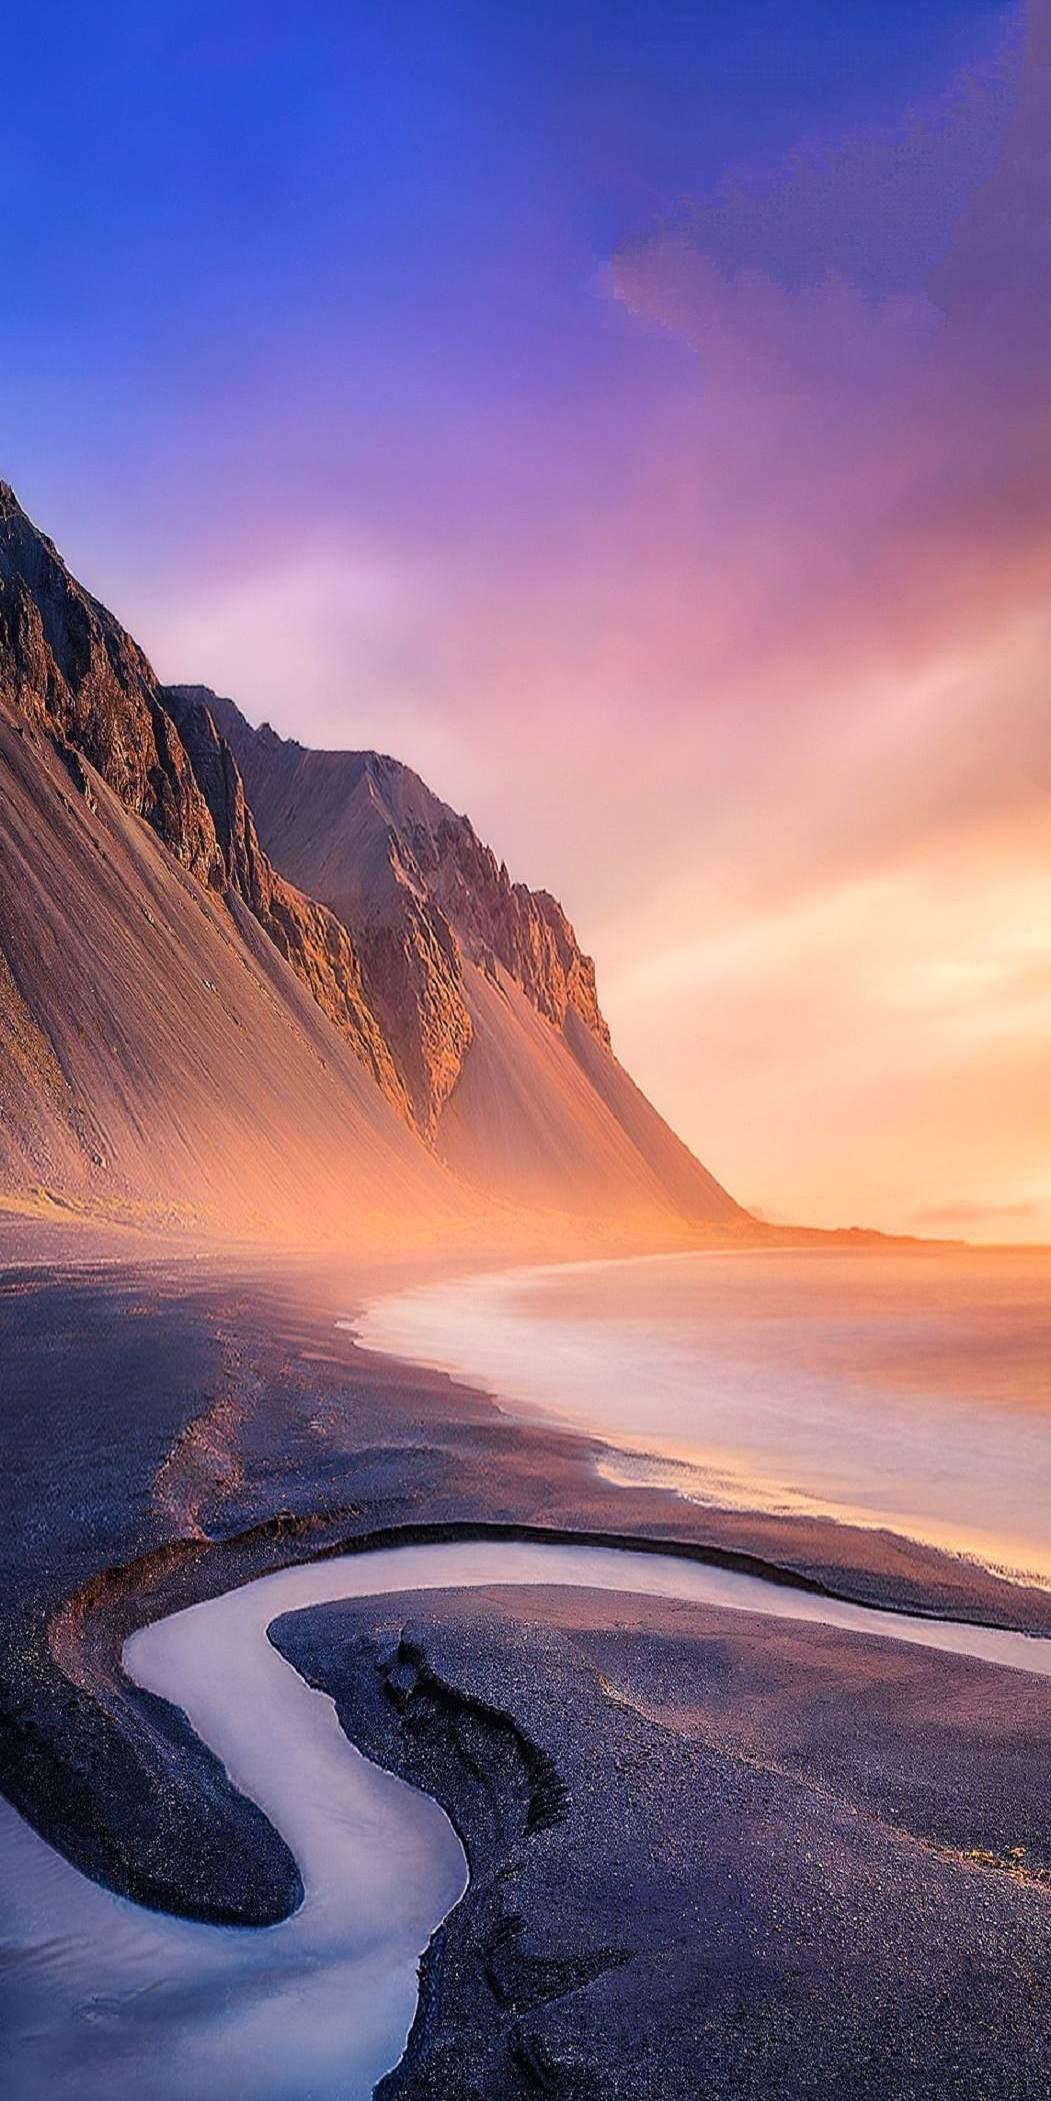 Beach Mountains iPhone X Wallpaper